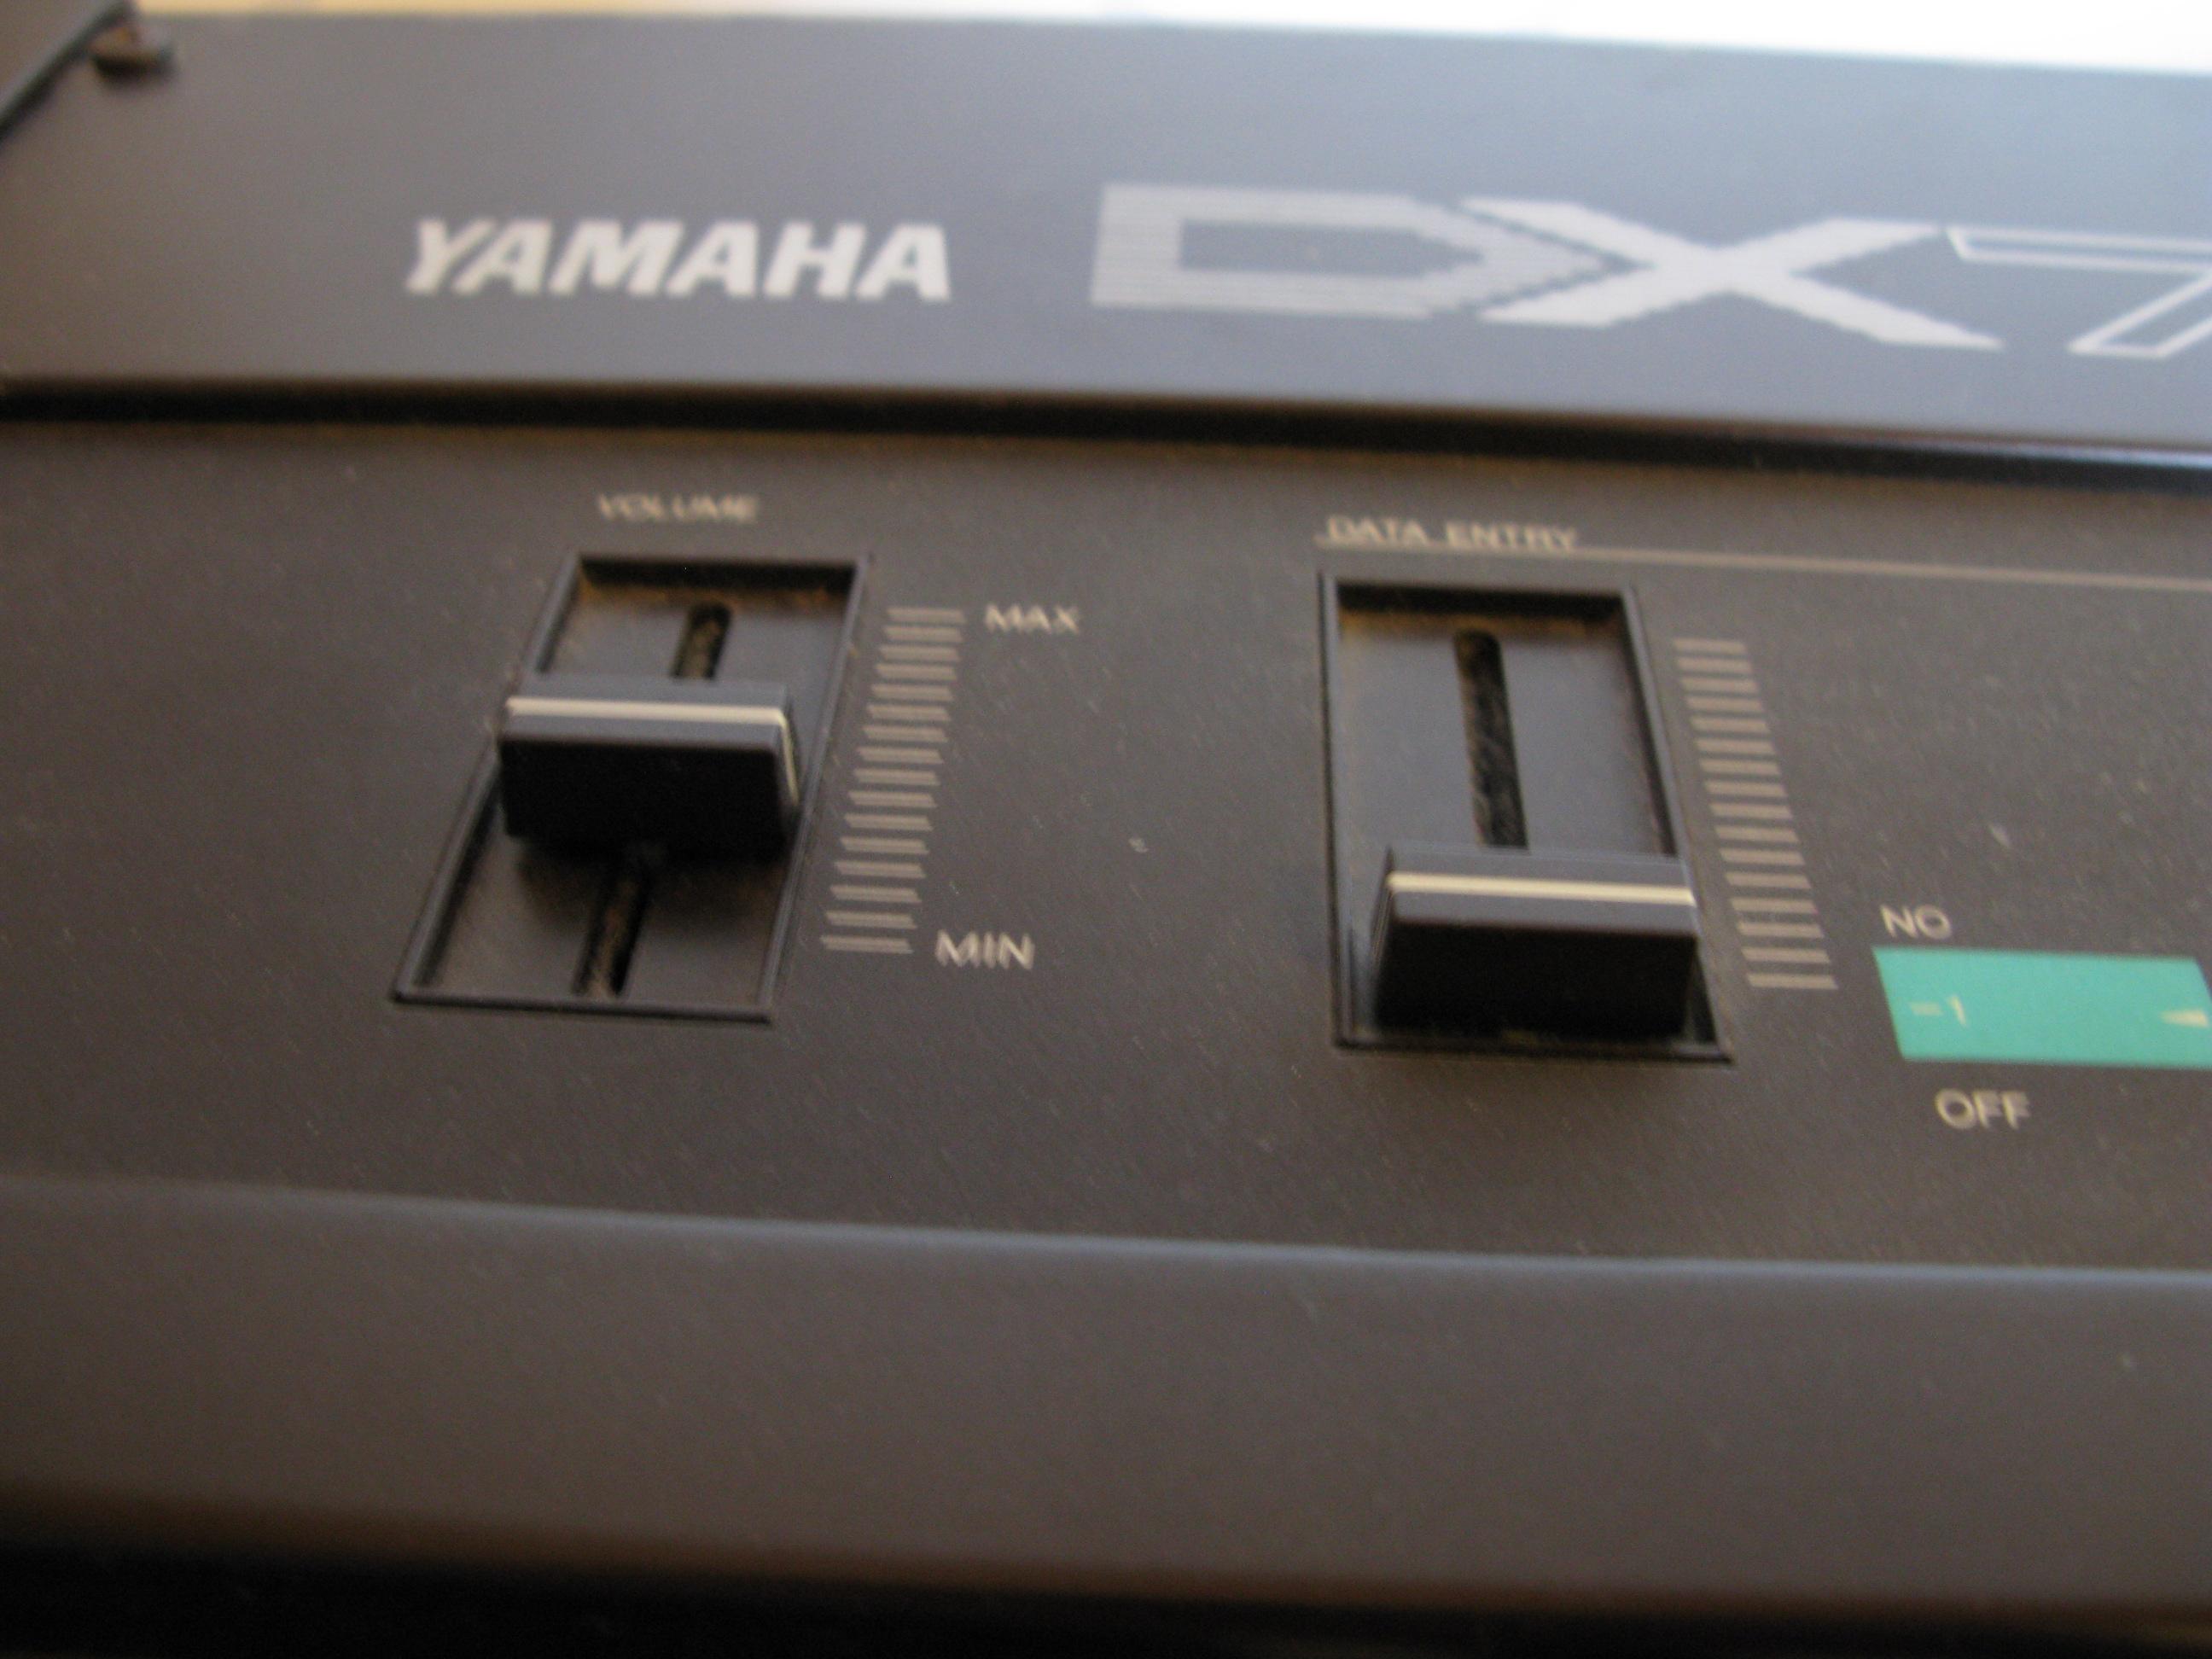 File:Yamaha DX7 volume & data entry sliders jpg - Wikimedia Commons